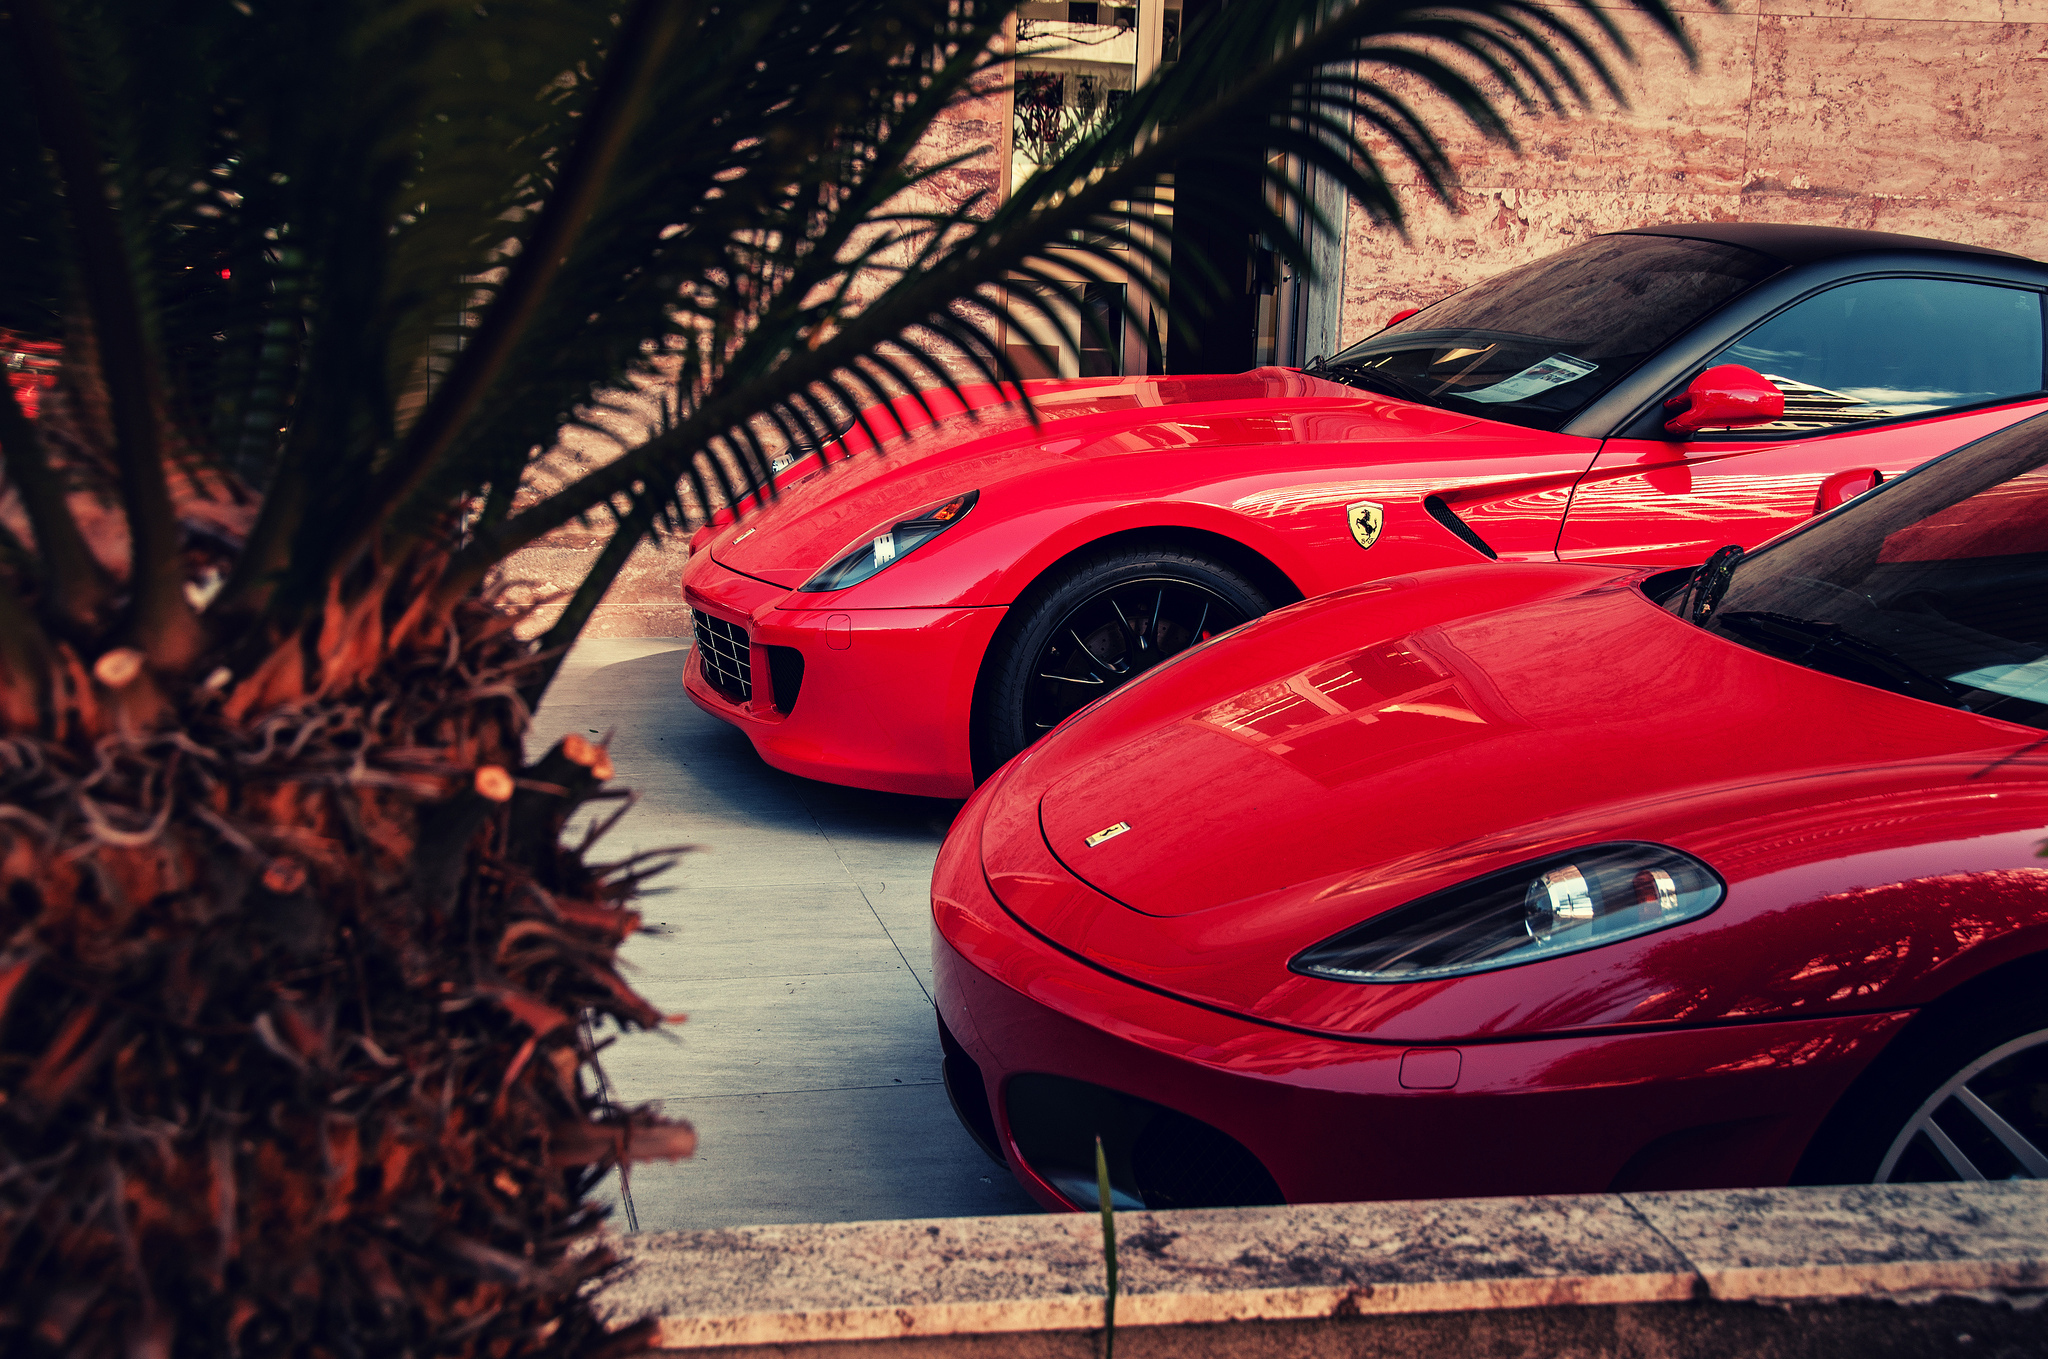 ferrari 360 modena cars